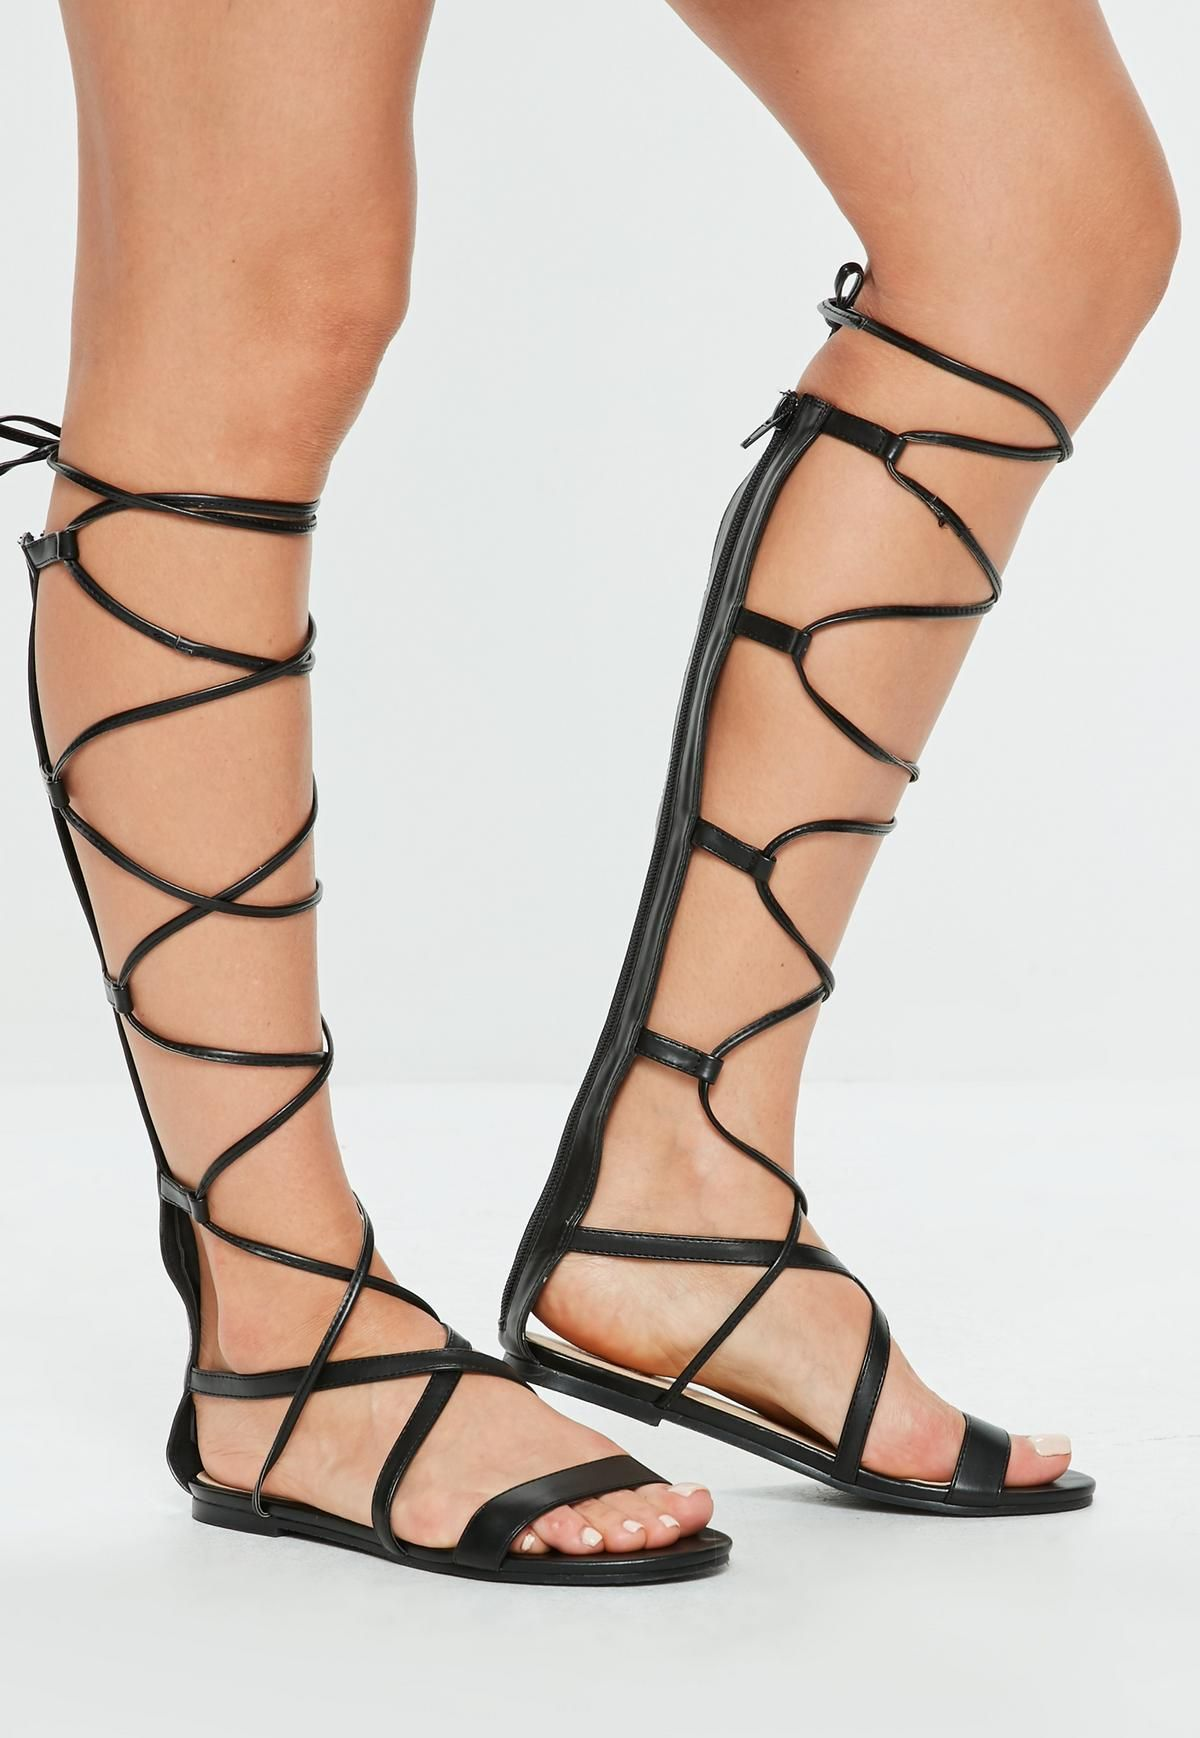 d6cd739c7 Black High Leg Gladiator Lace Up Flat Sandal